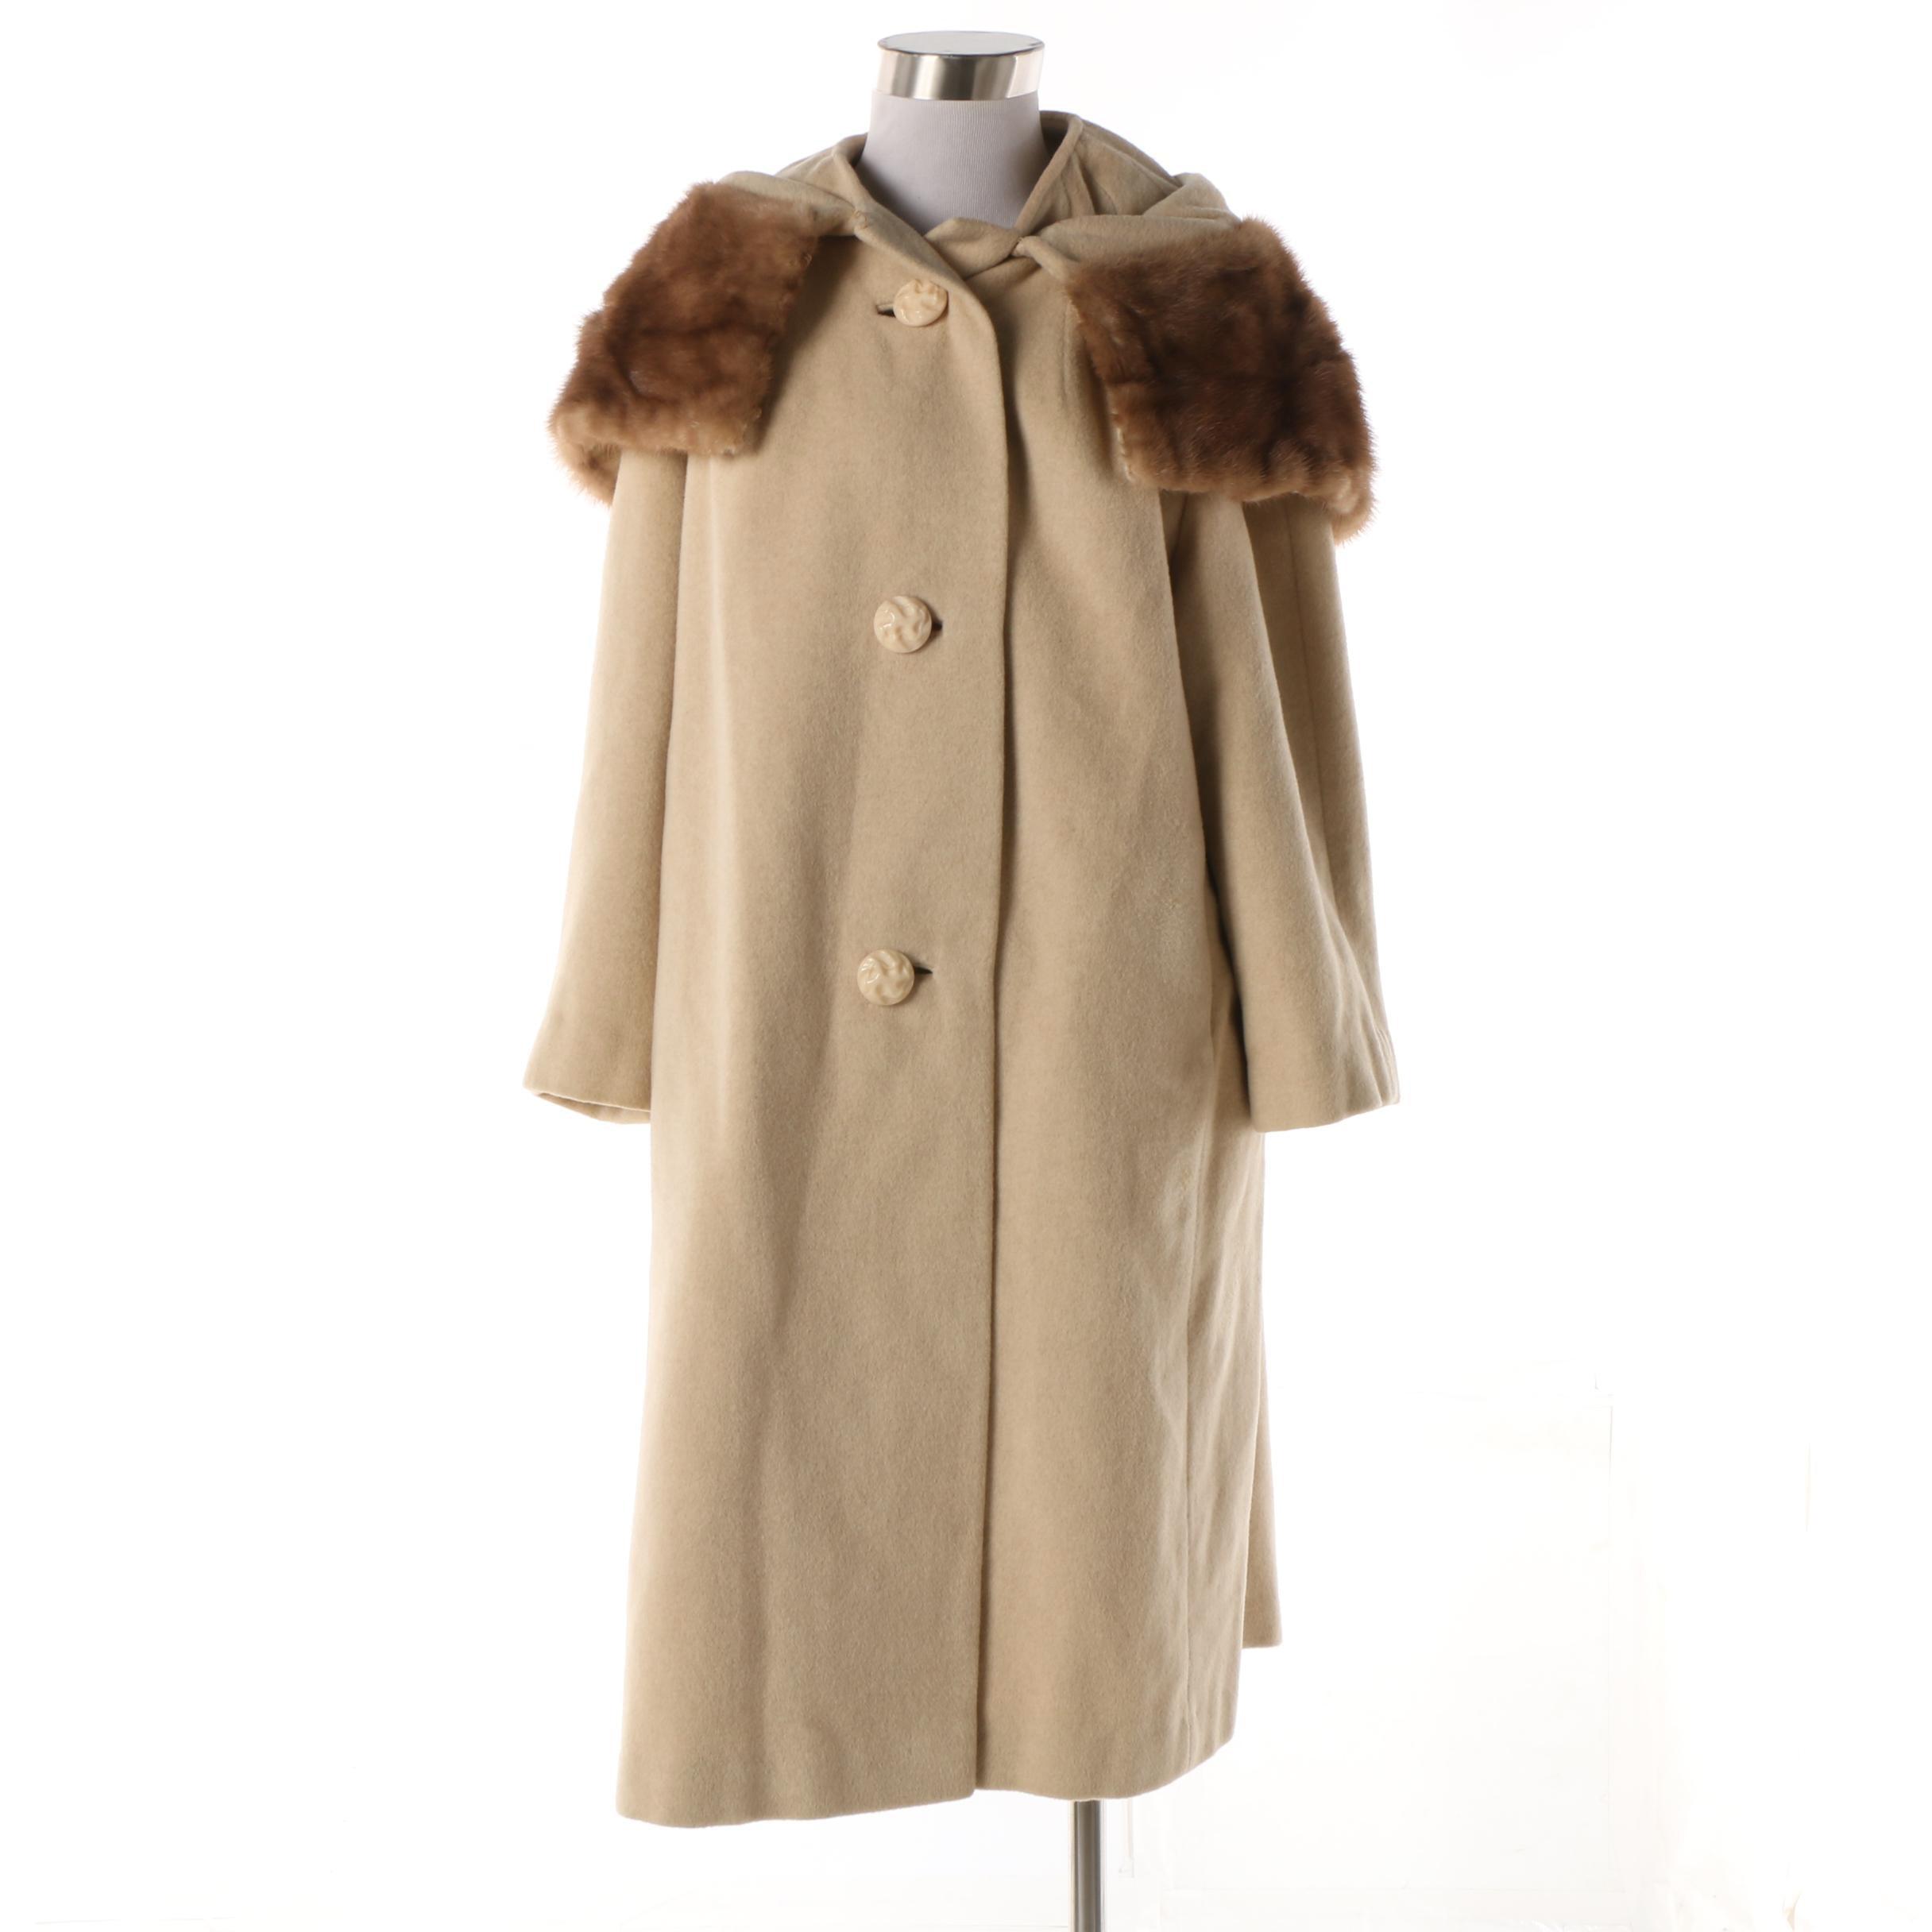 Women's Vintage Printzess Fashion Cream Wool Blend Coat with Mink Fur Collar